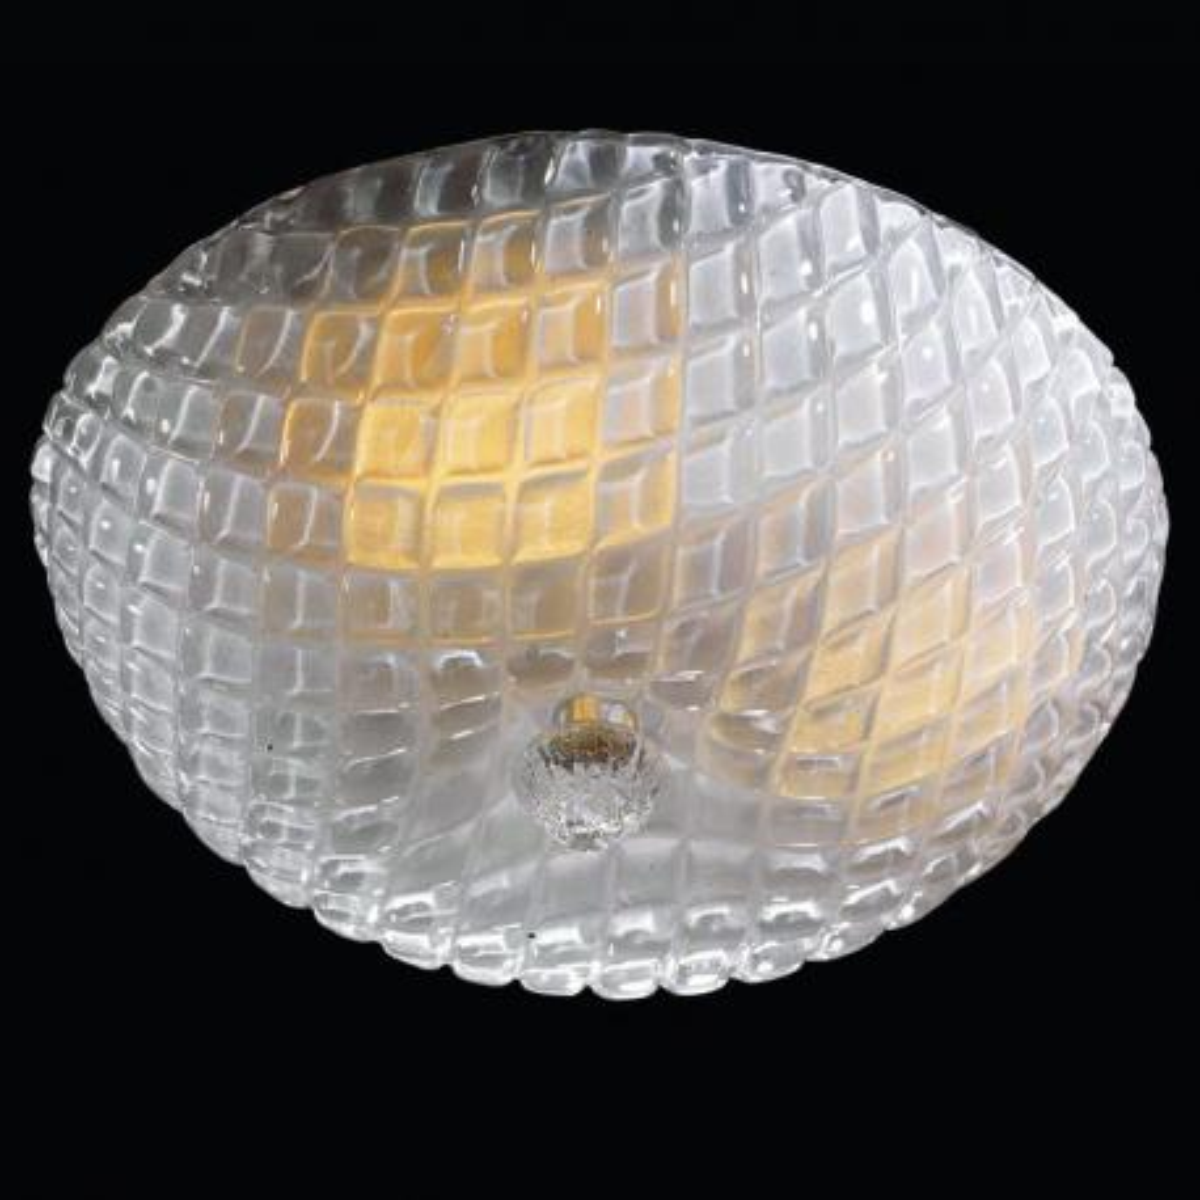 """Selah"" Murano glas deckenleuchte - 3 flammig - transparent"